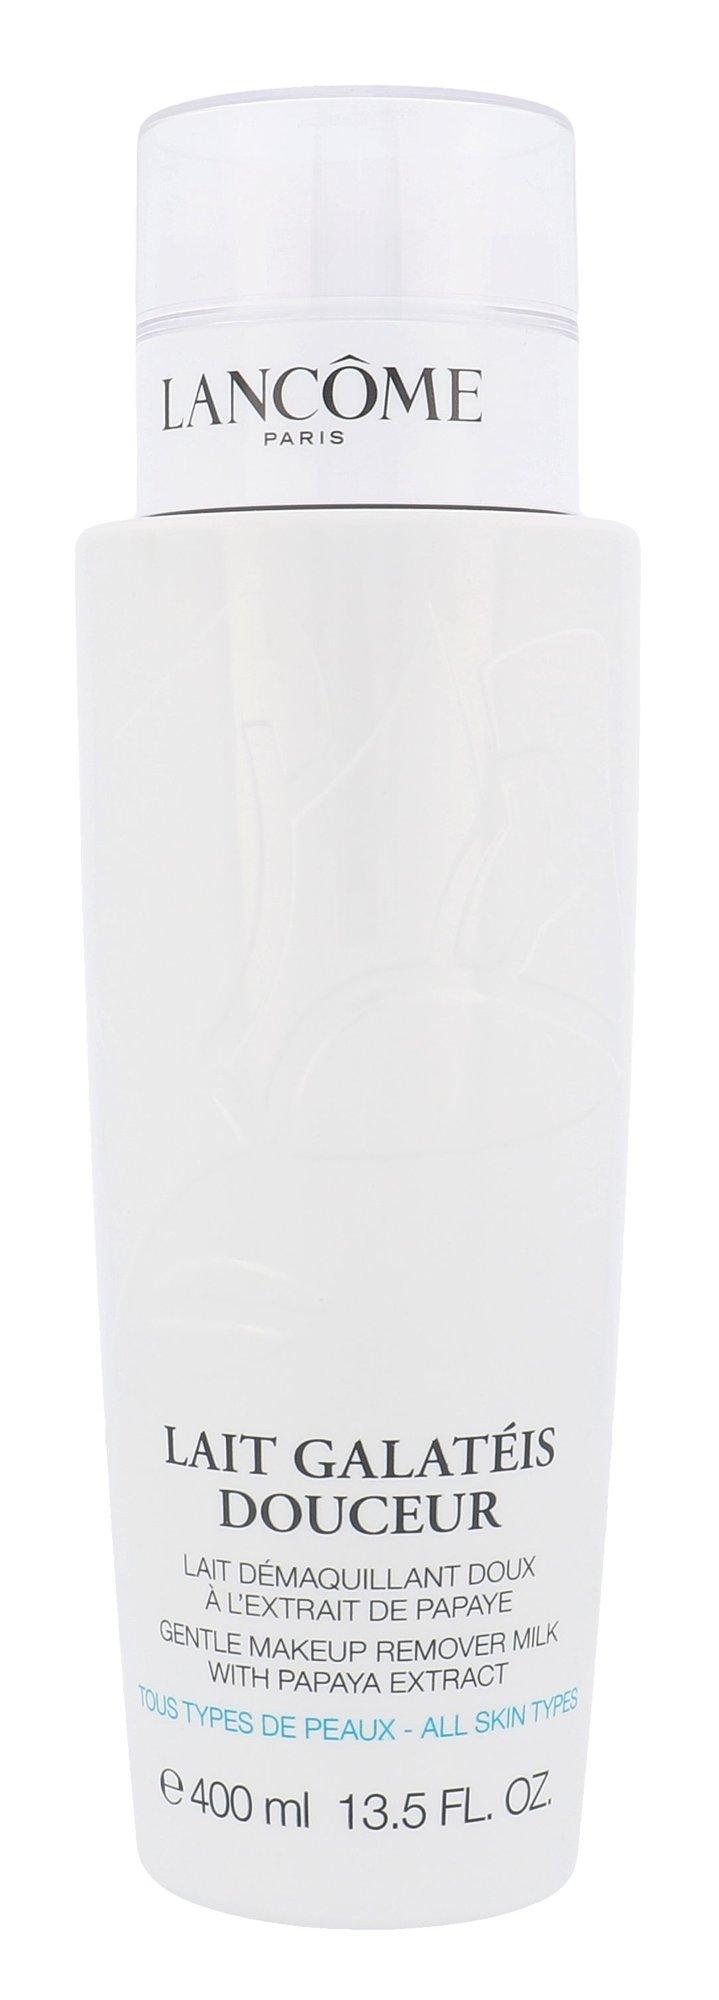 Lancôme Galatéis Douceur Cosmetic 400ml